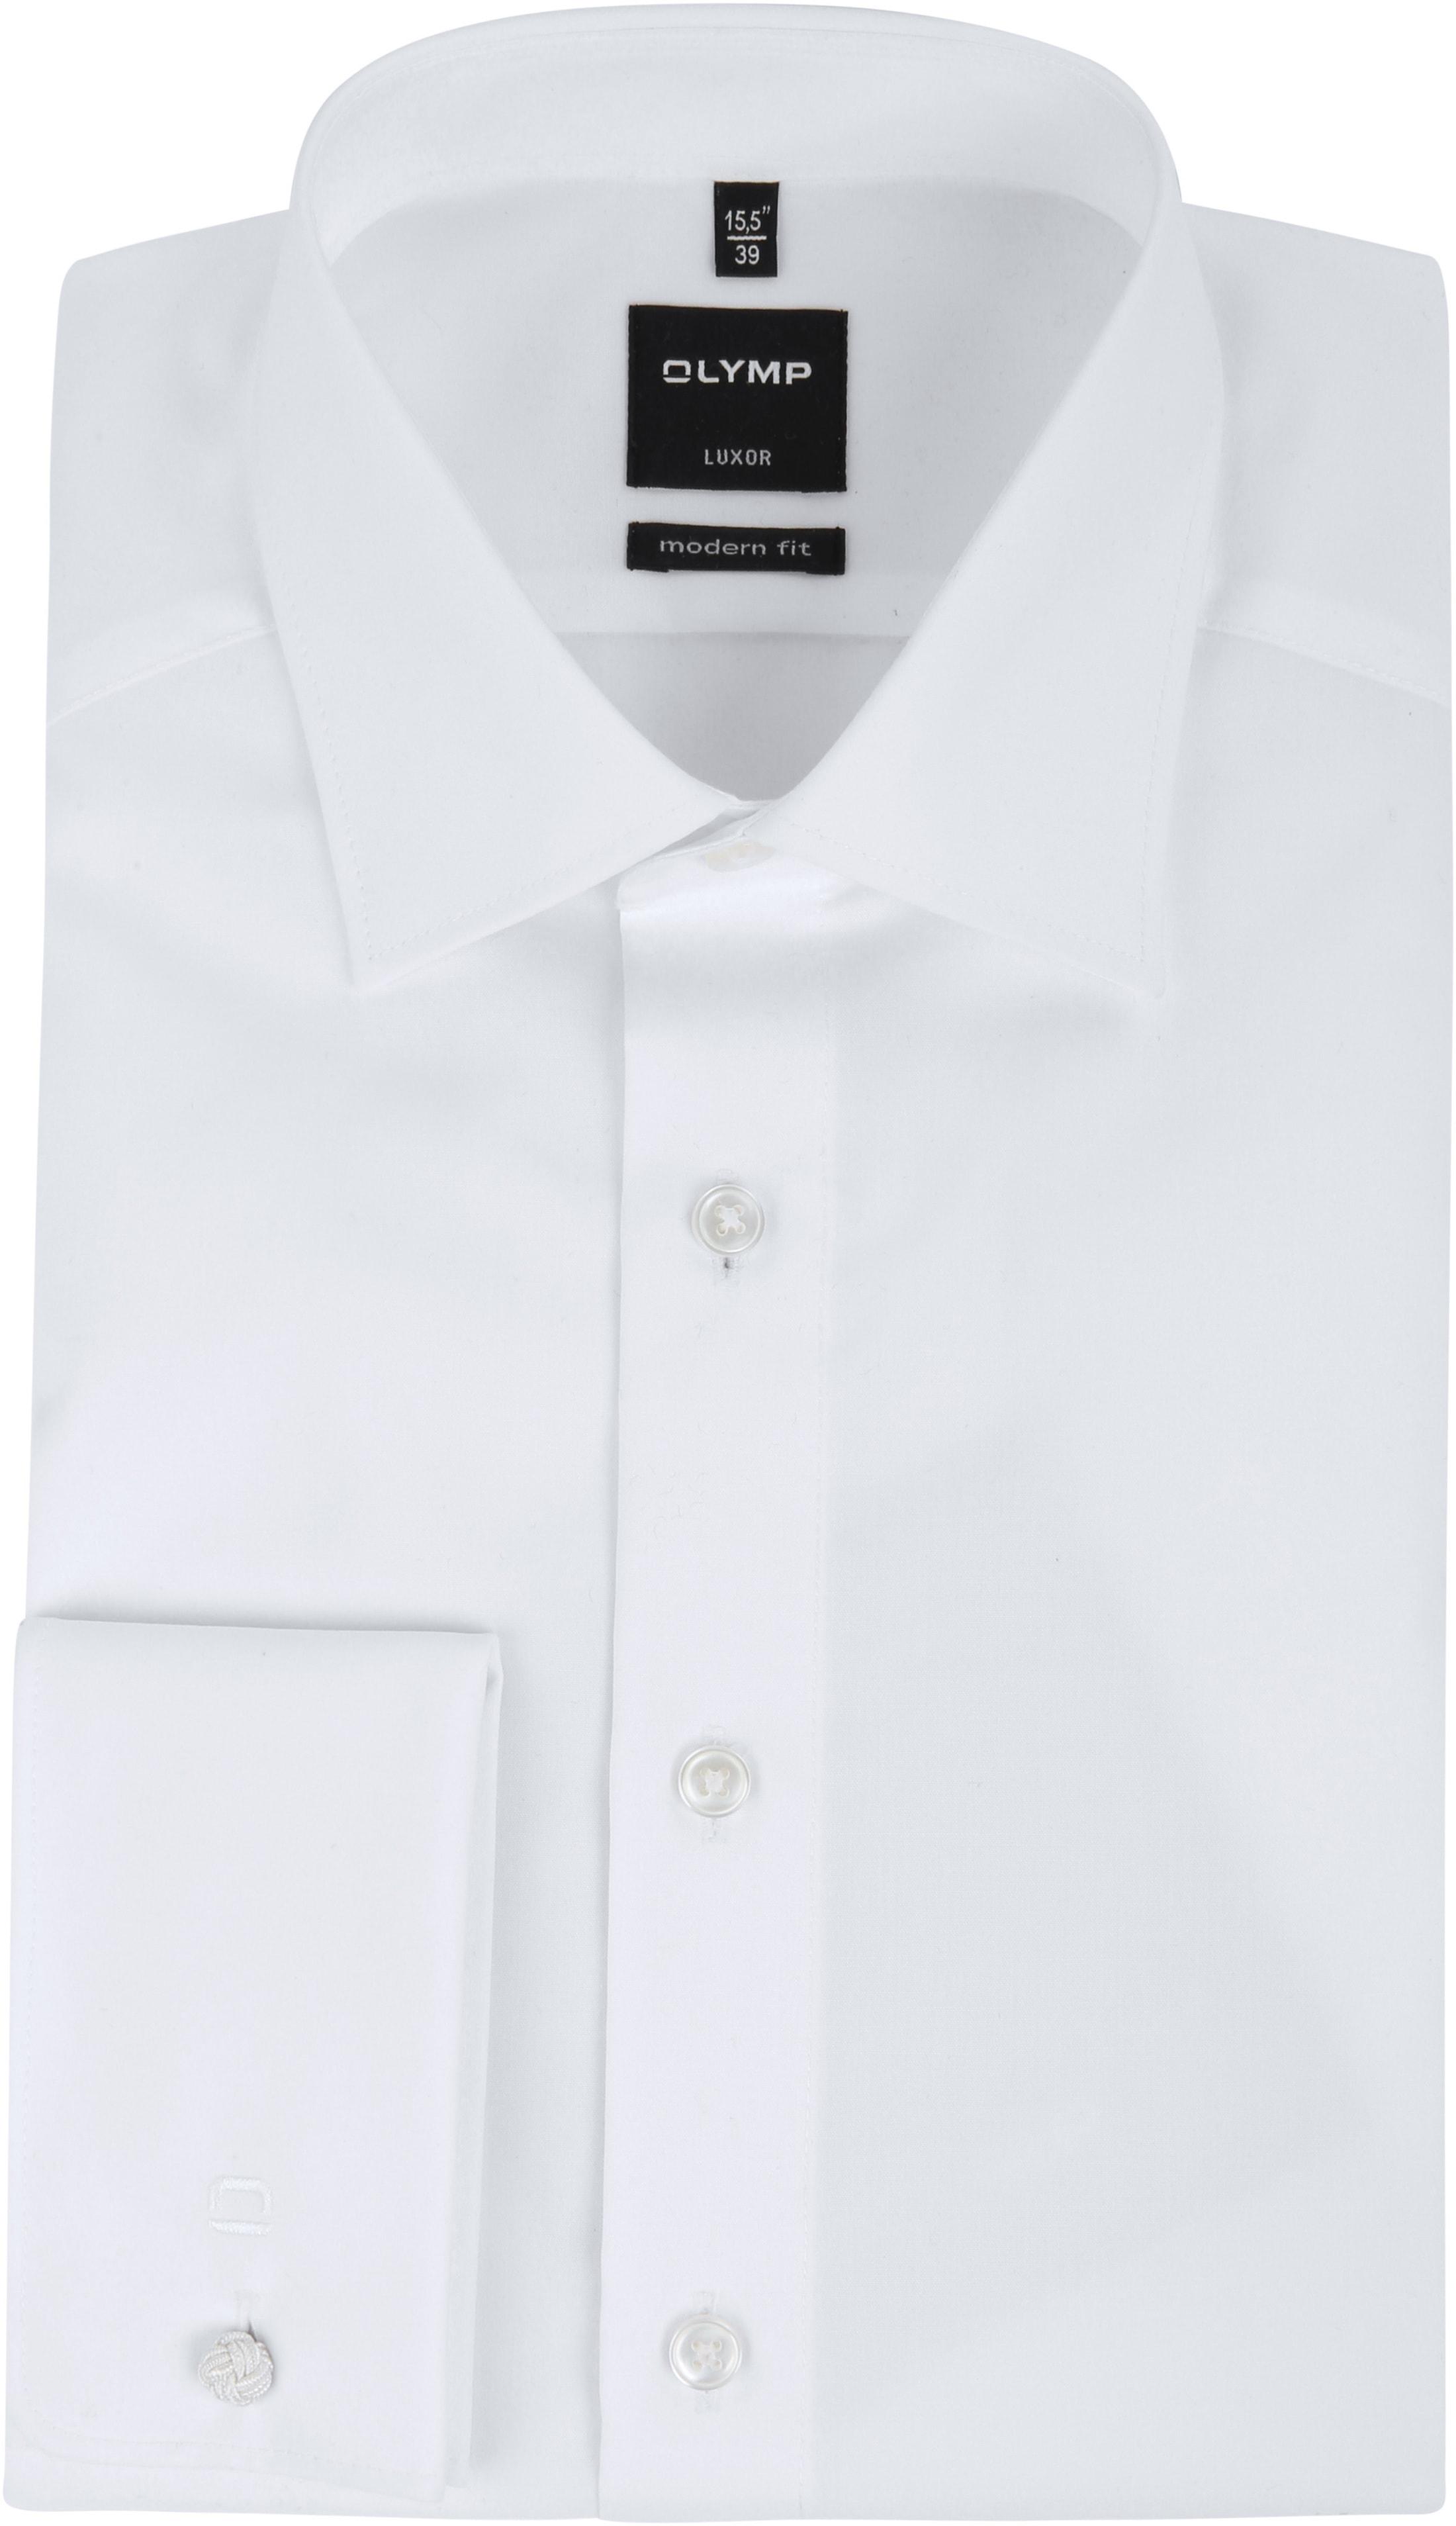 OLYMP Luxor Dubbelmanchet Overhemd Wit